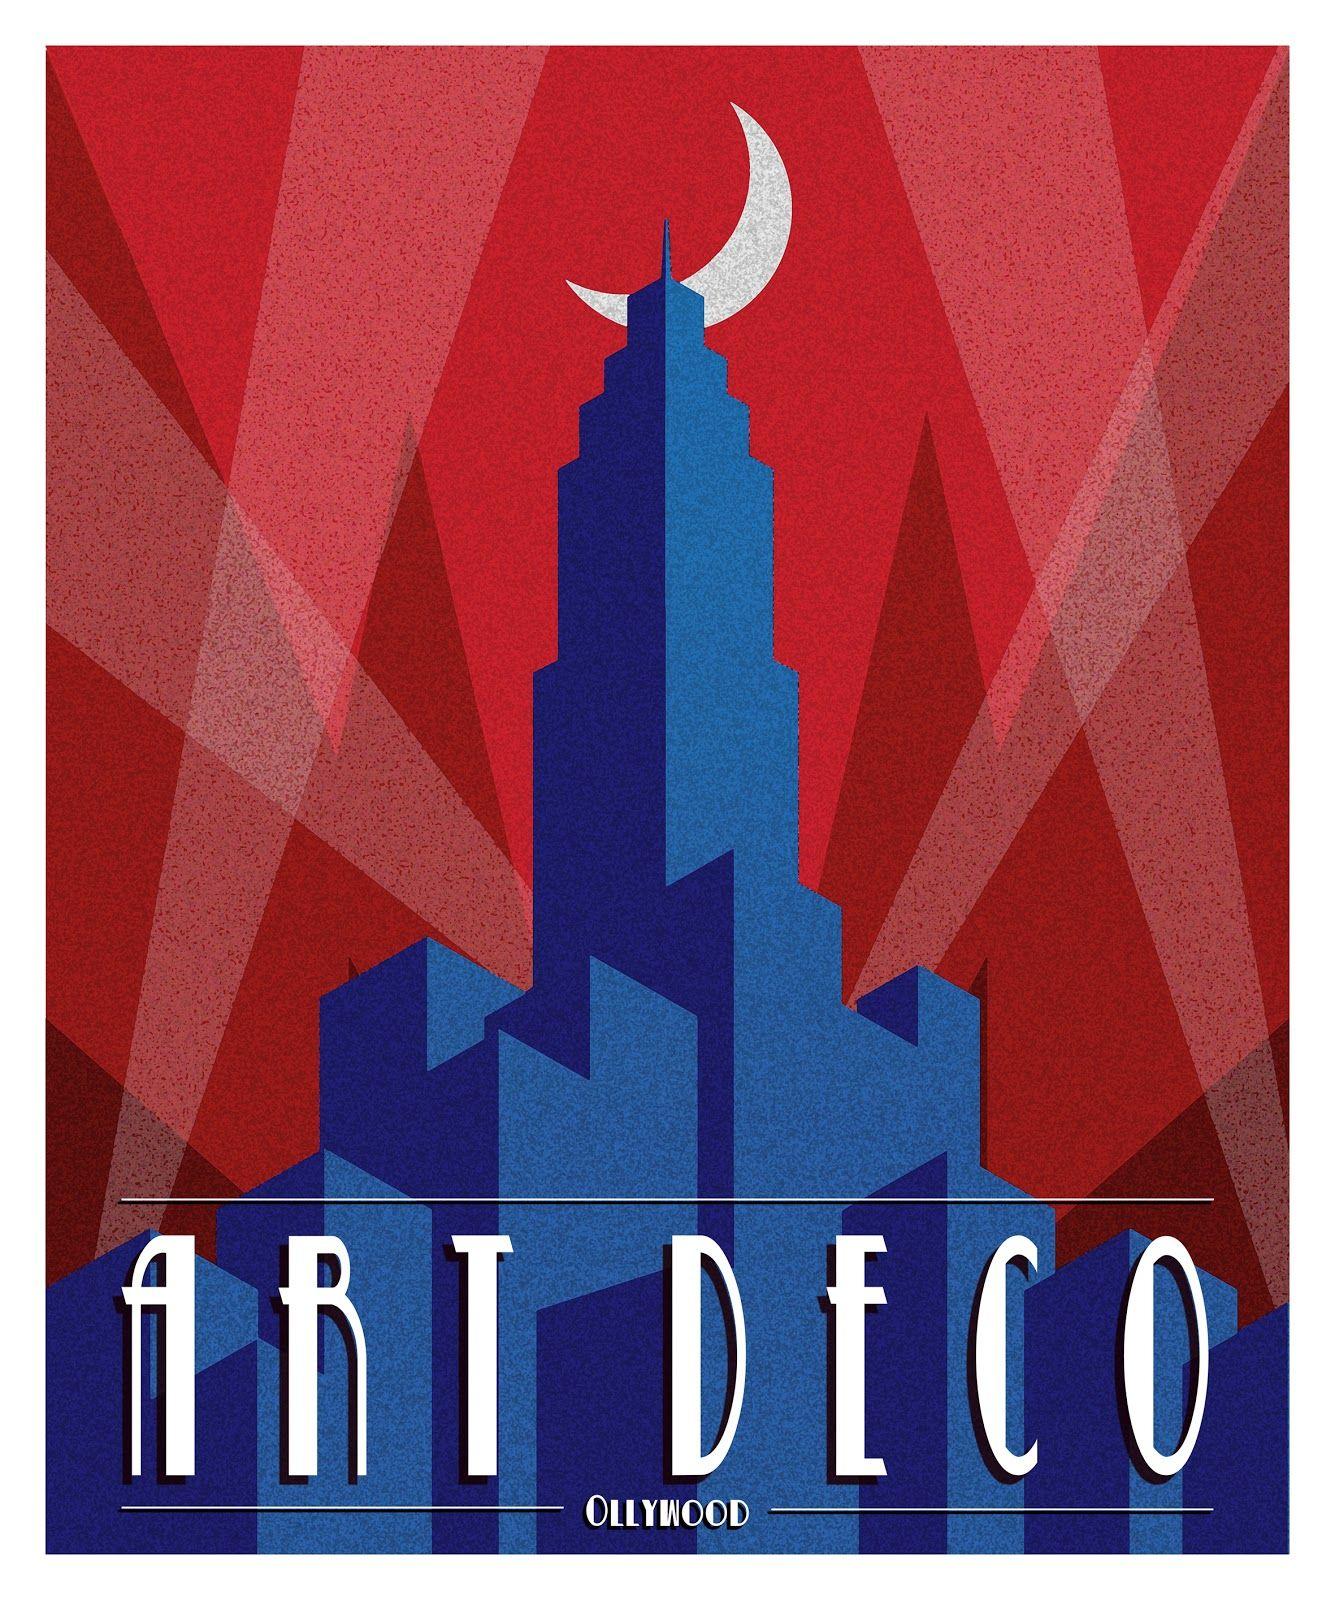 Poster design assignment - My Original Poster Design